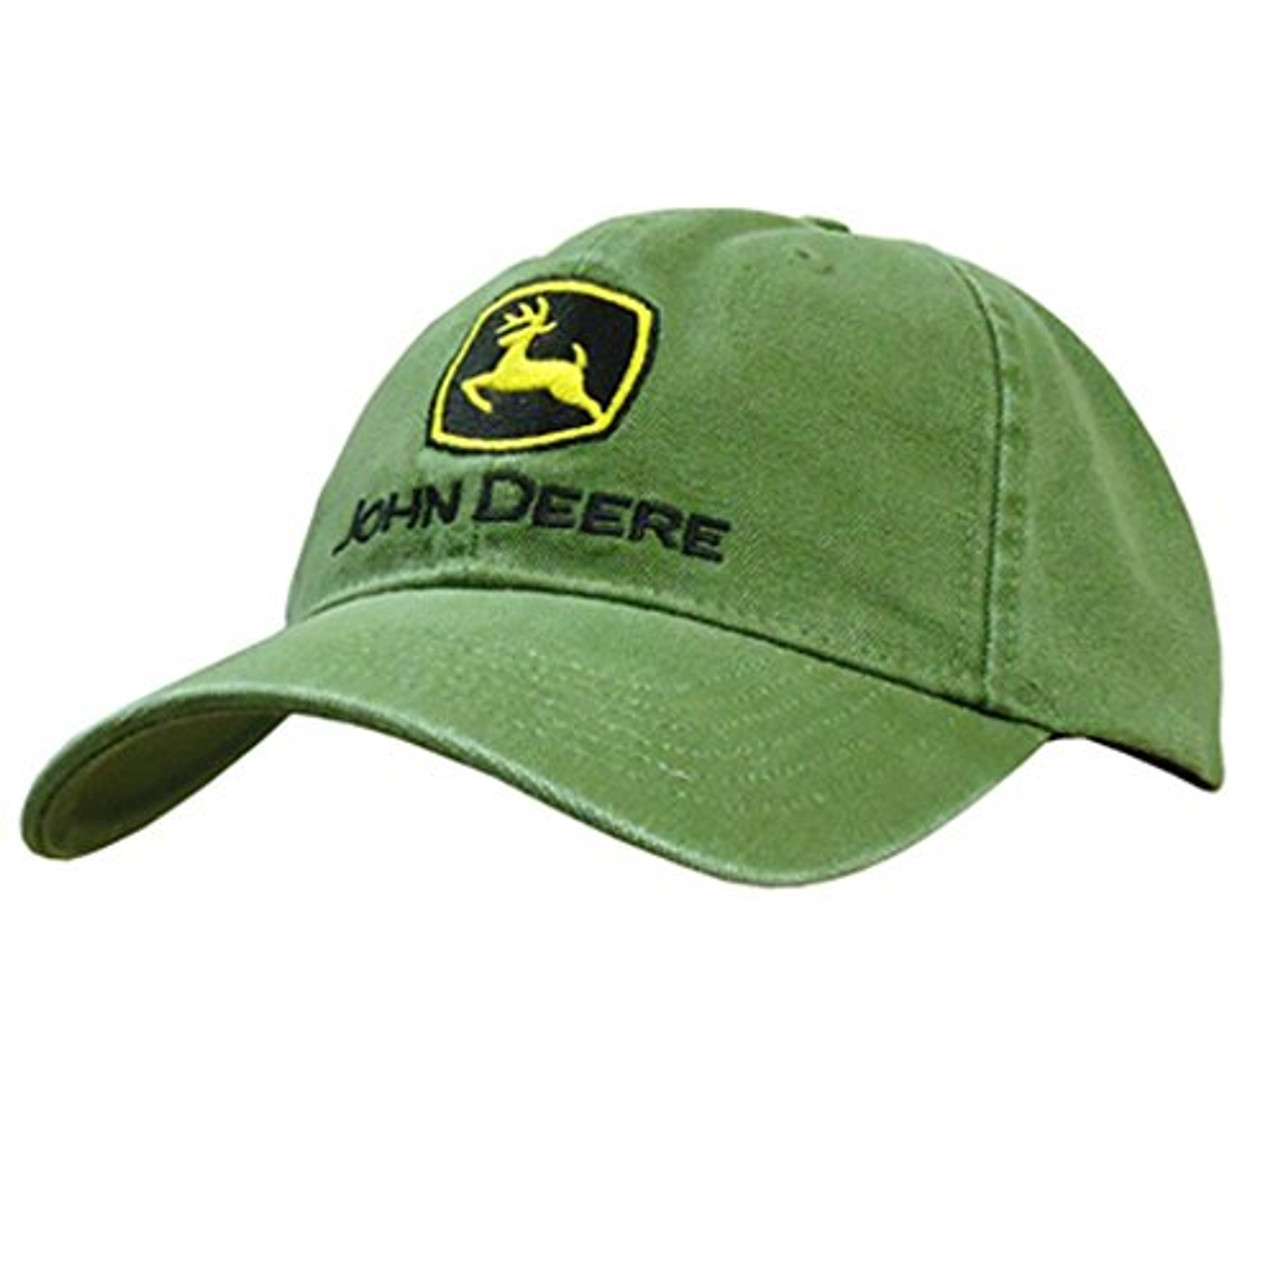 4e006de1b05 John Deere Men s Low Profile Embroidered Canvas Hat - Trenz Shirt Company